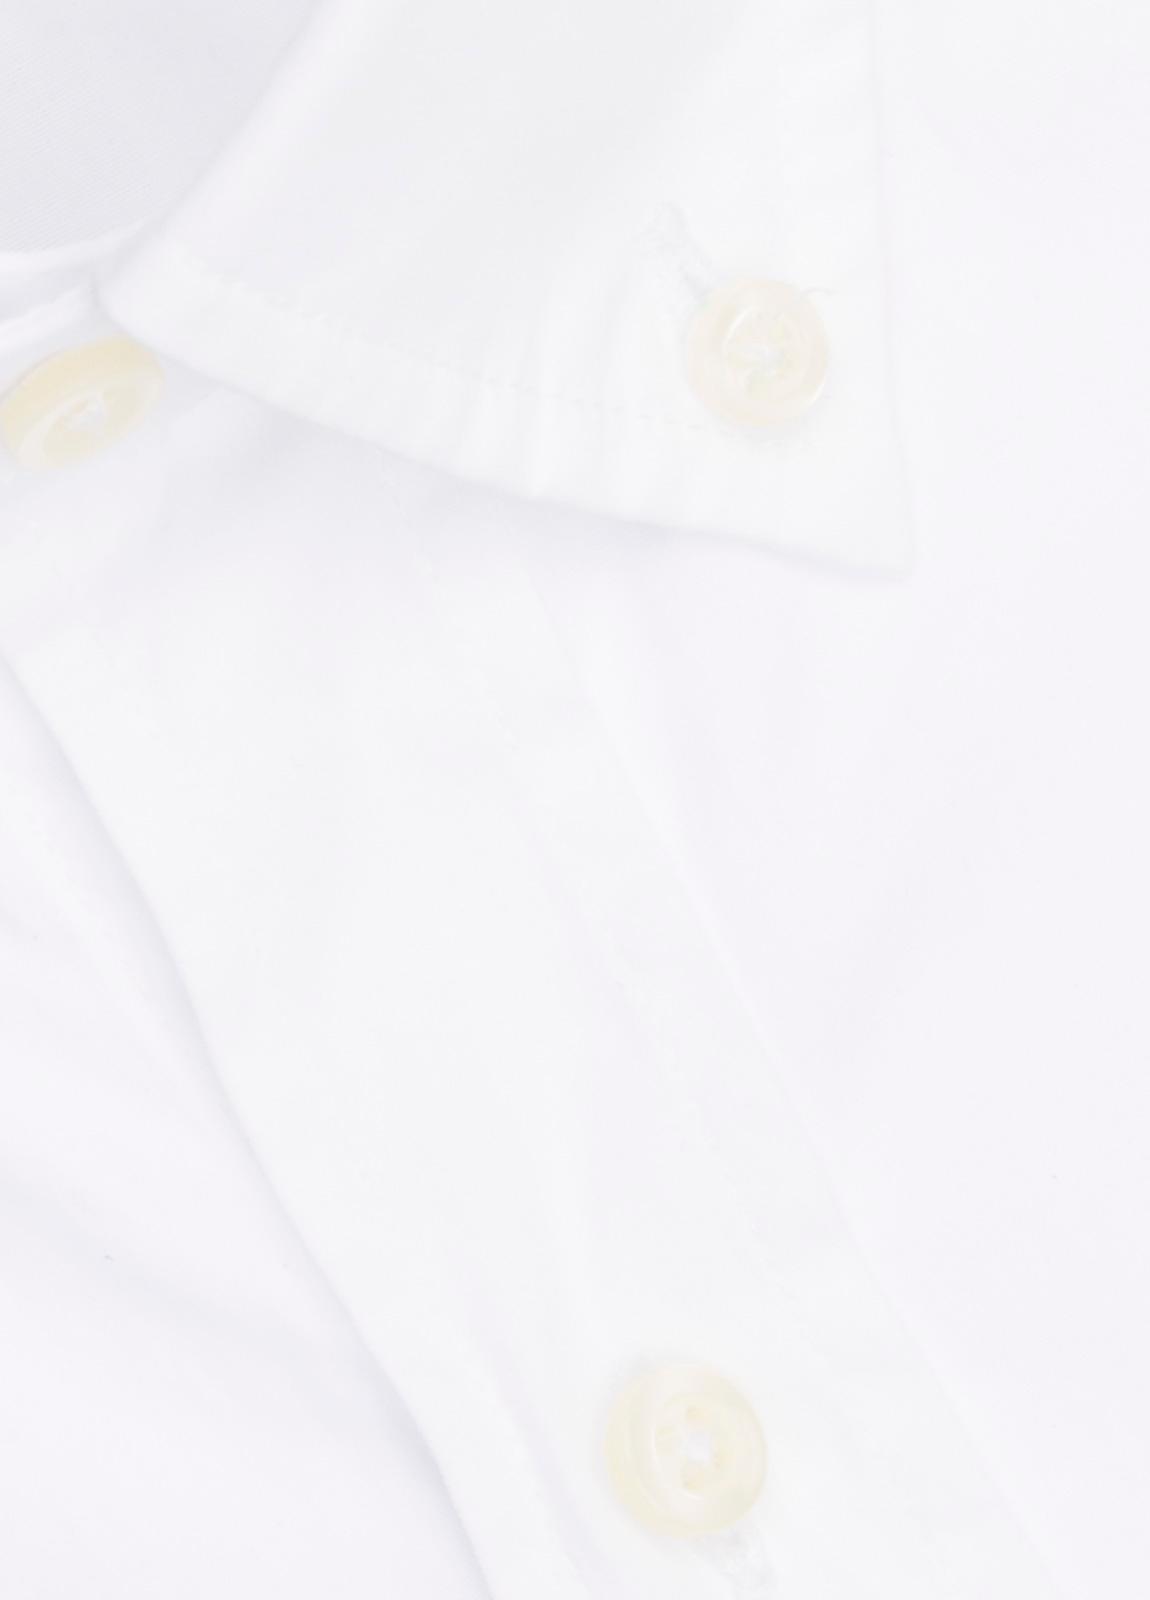 Camisa M/Corta sport FUREST COLECCIÓN Regular FIT algodón blanco - Ítem1